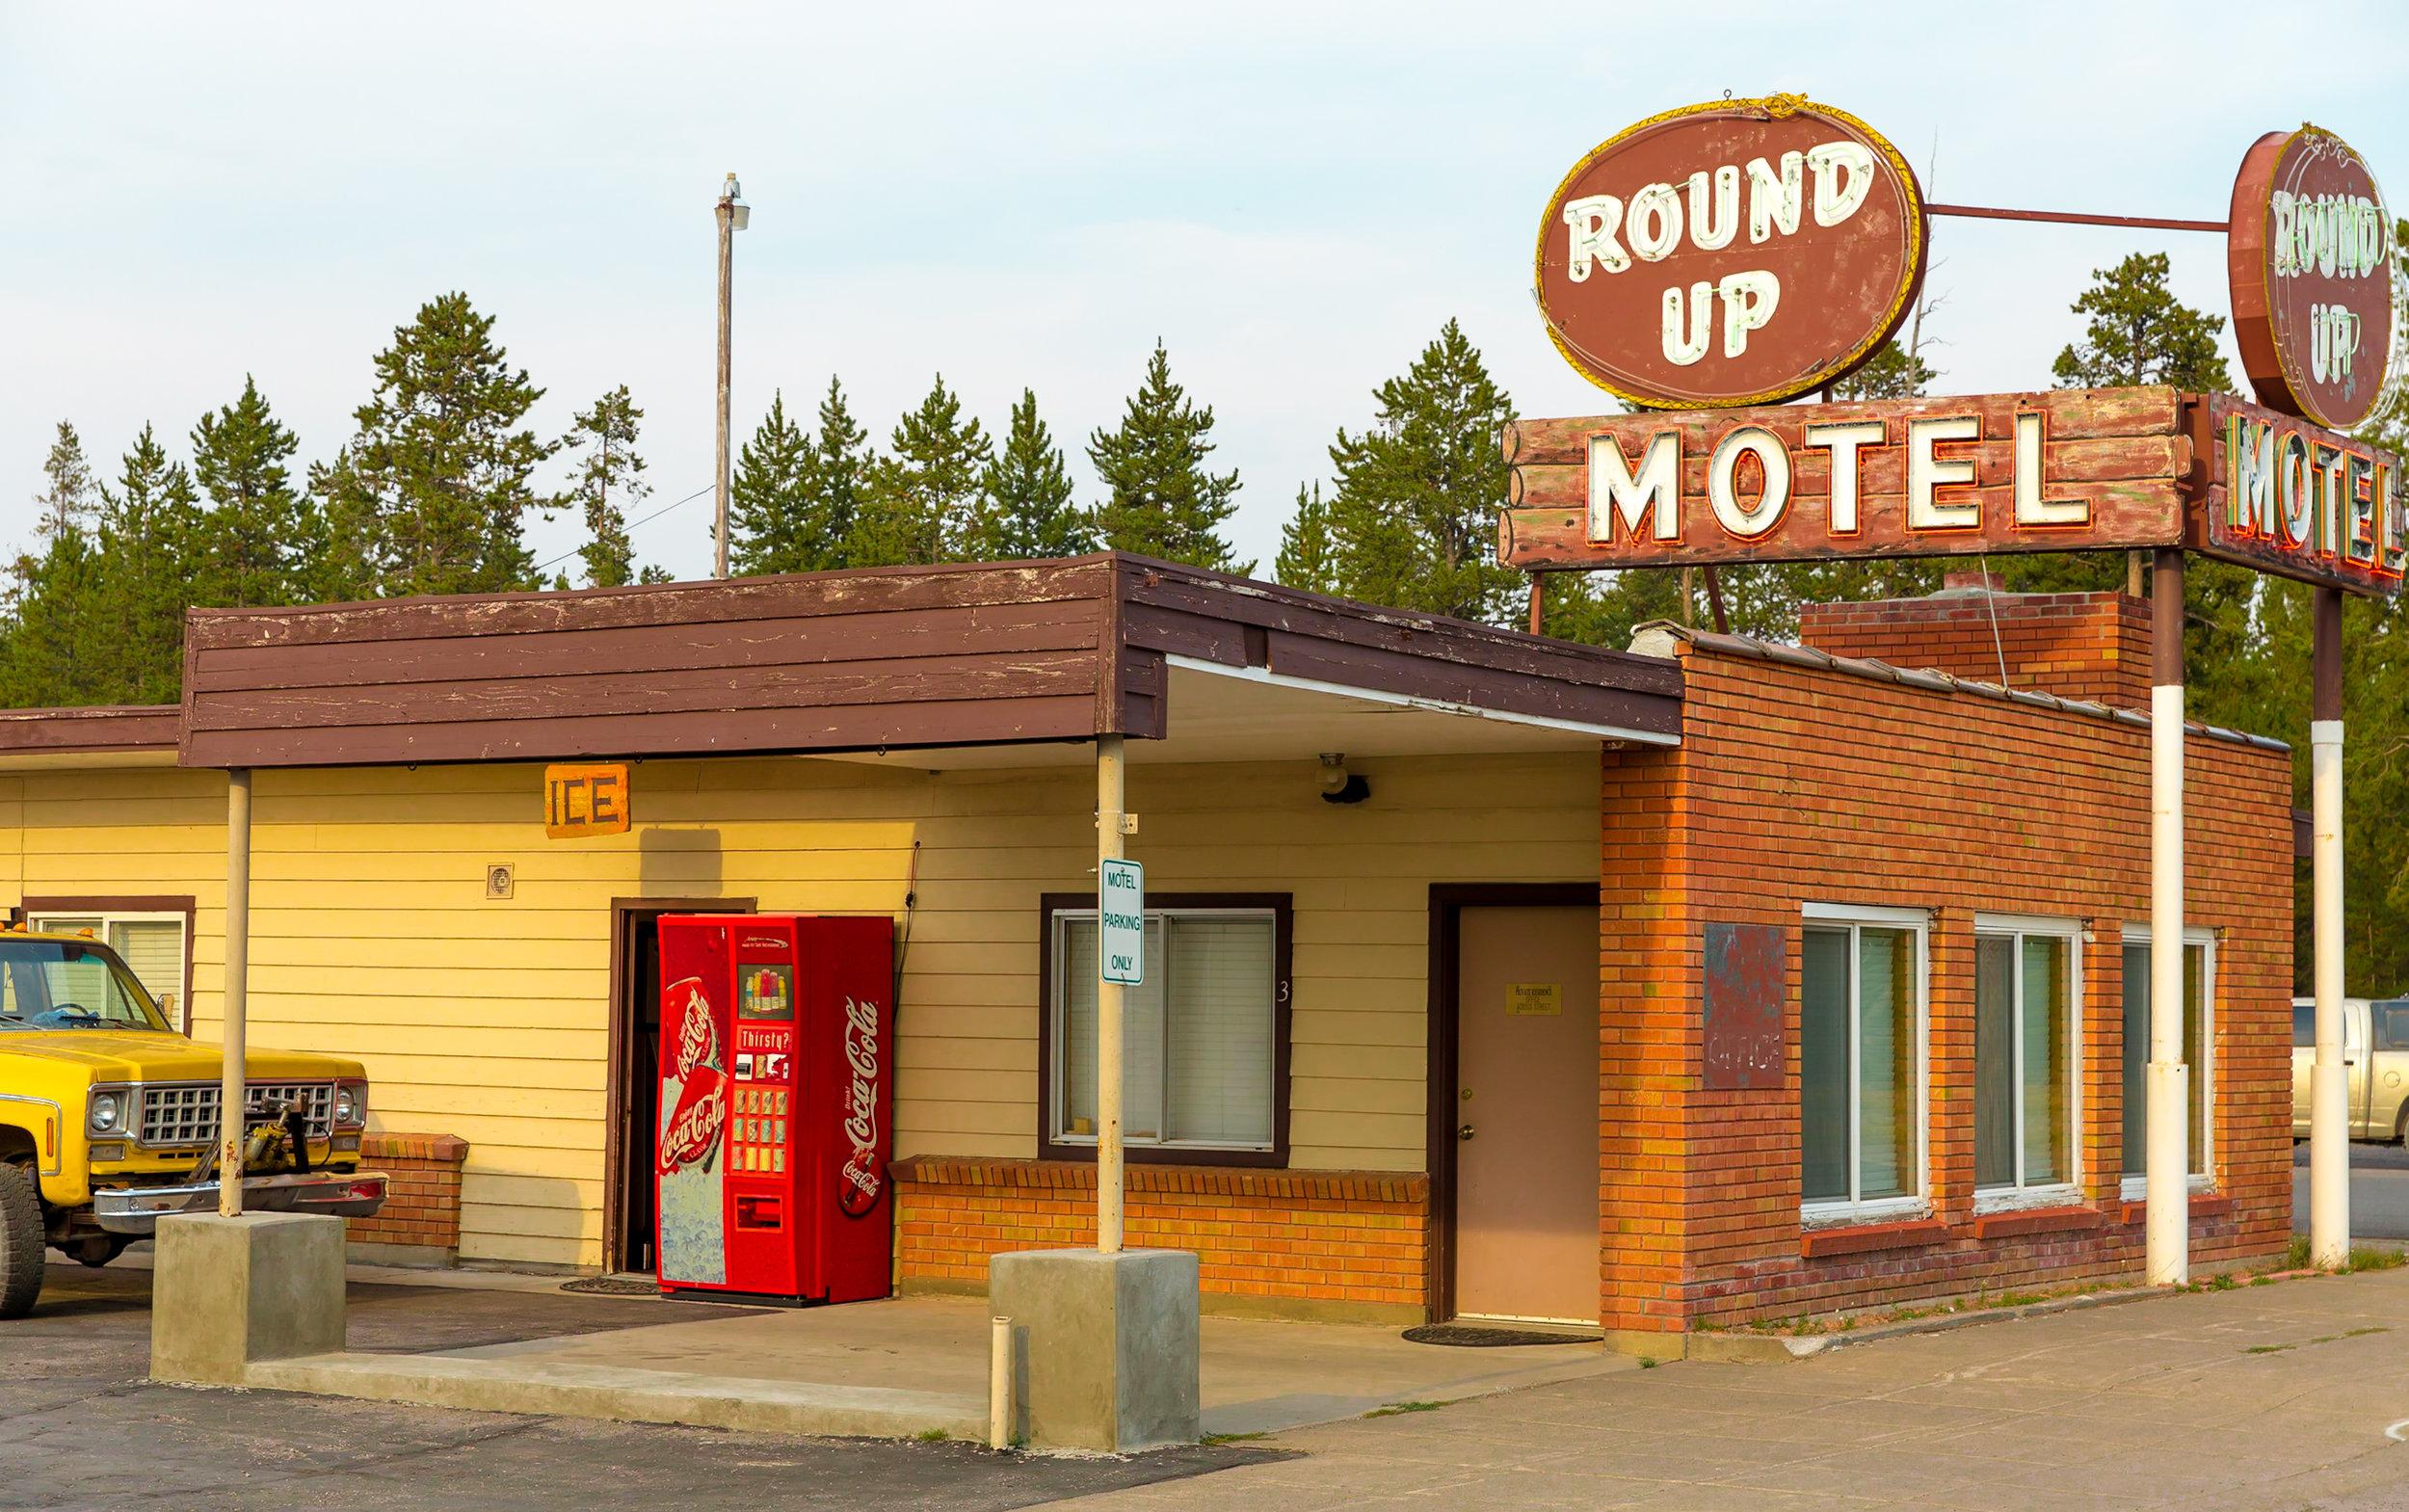 170821 USA roadtrip - wyoming - 2262.jpg